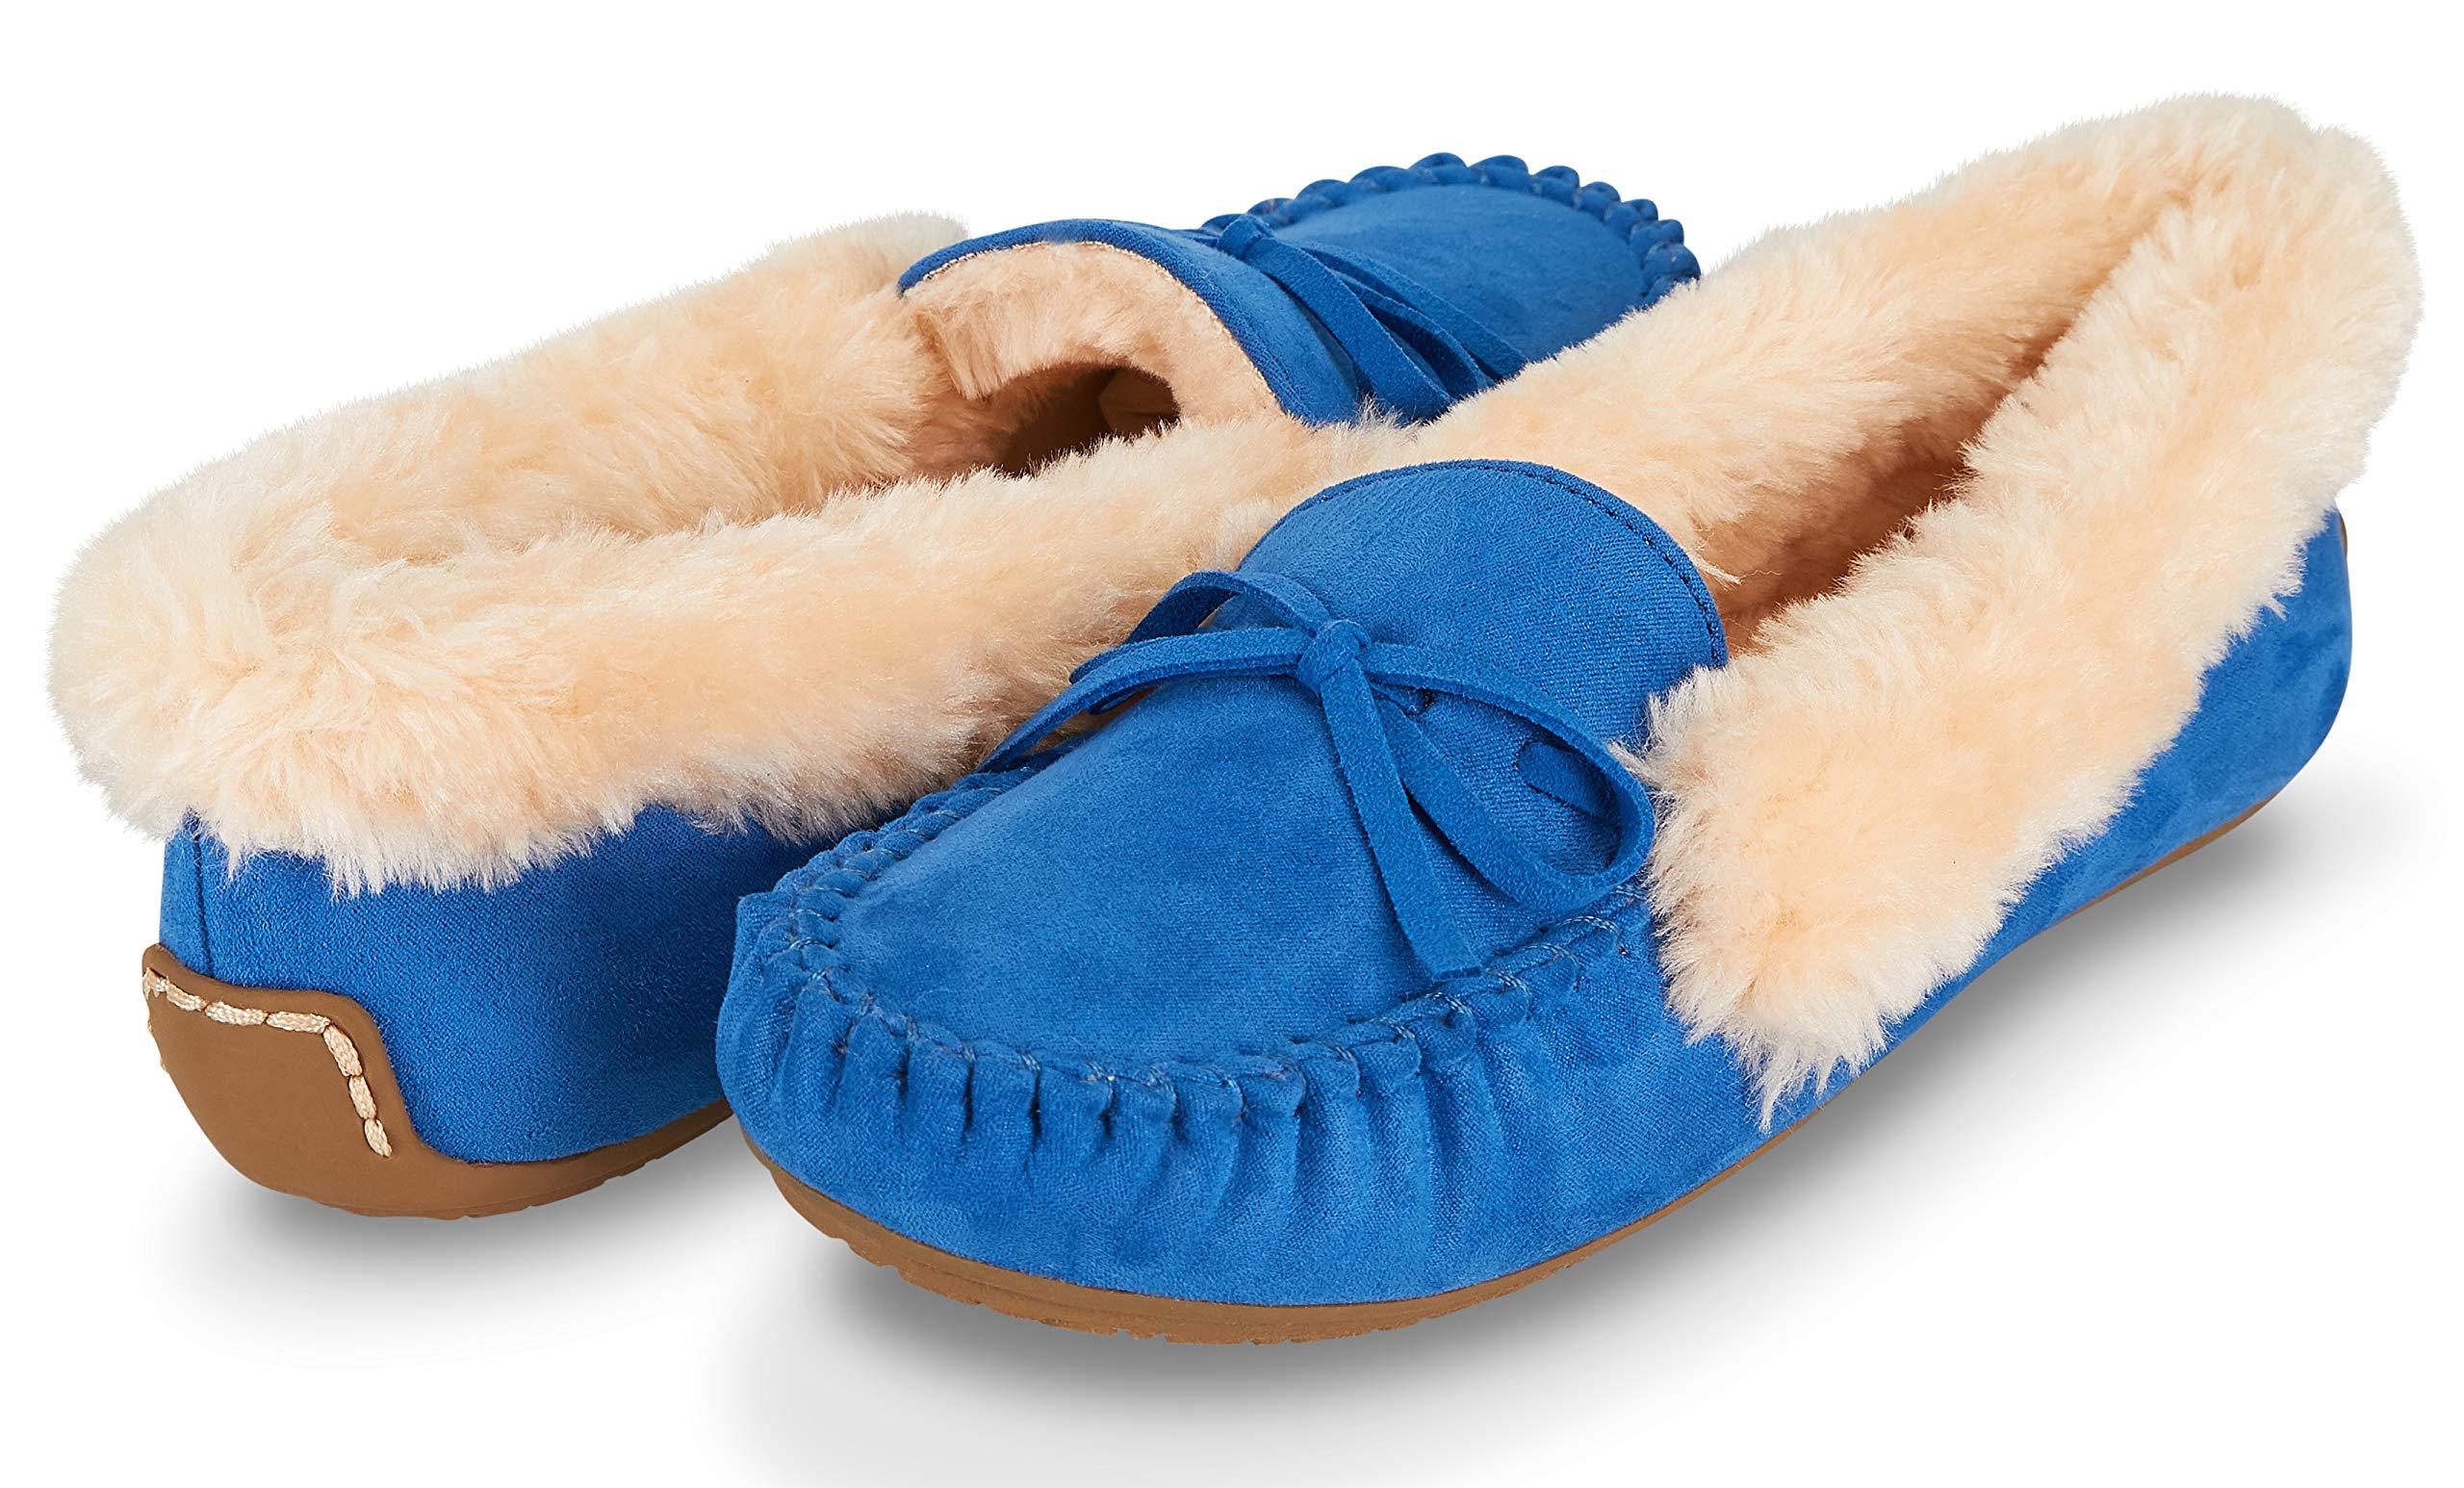 c5ecac07276 Floopi Womens Indoor Outdoor Basic Memory Foam Moccasin Slipper W Faux Fur  Collar (8